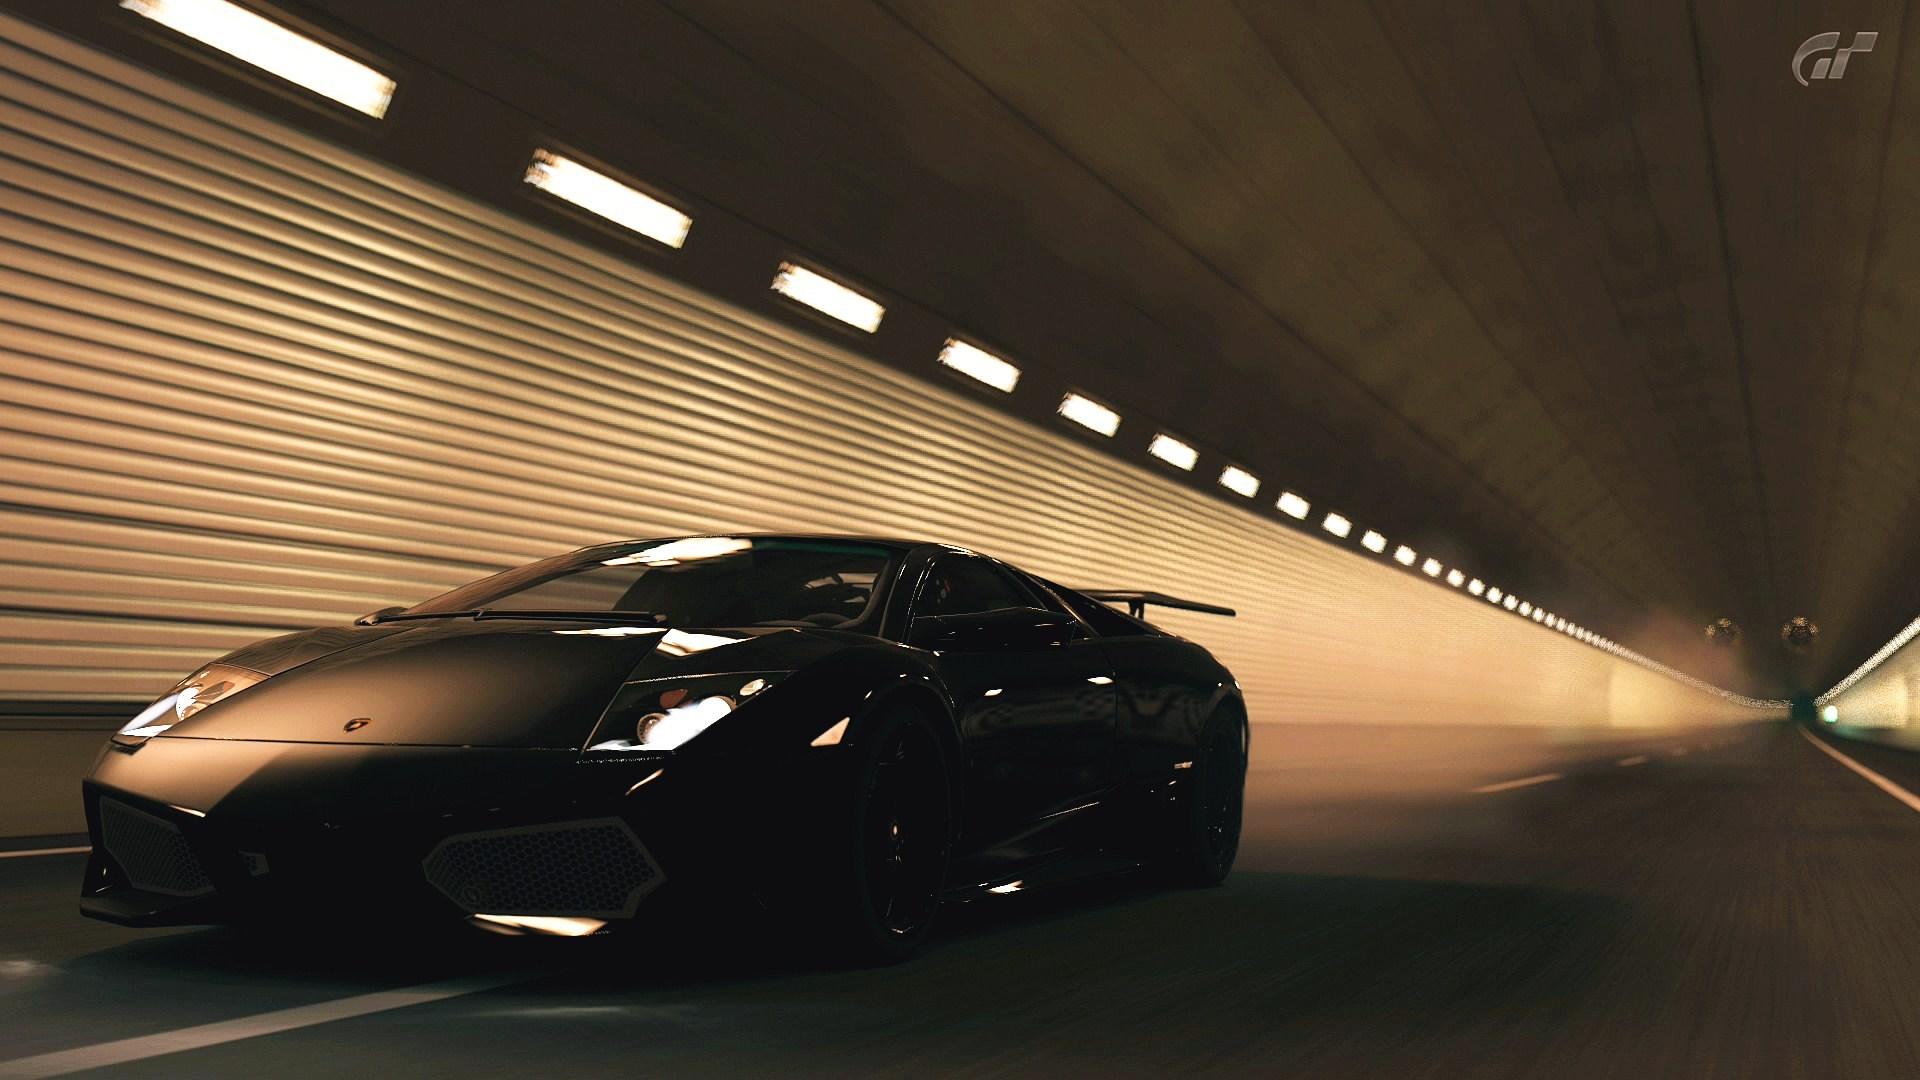 Lamborghini Car Tunnel Lights